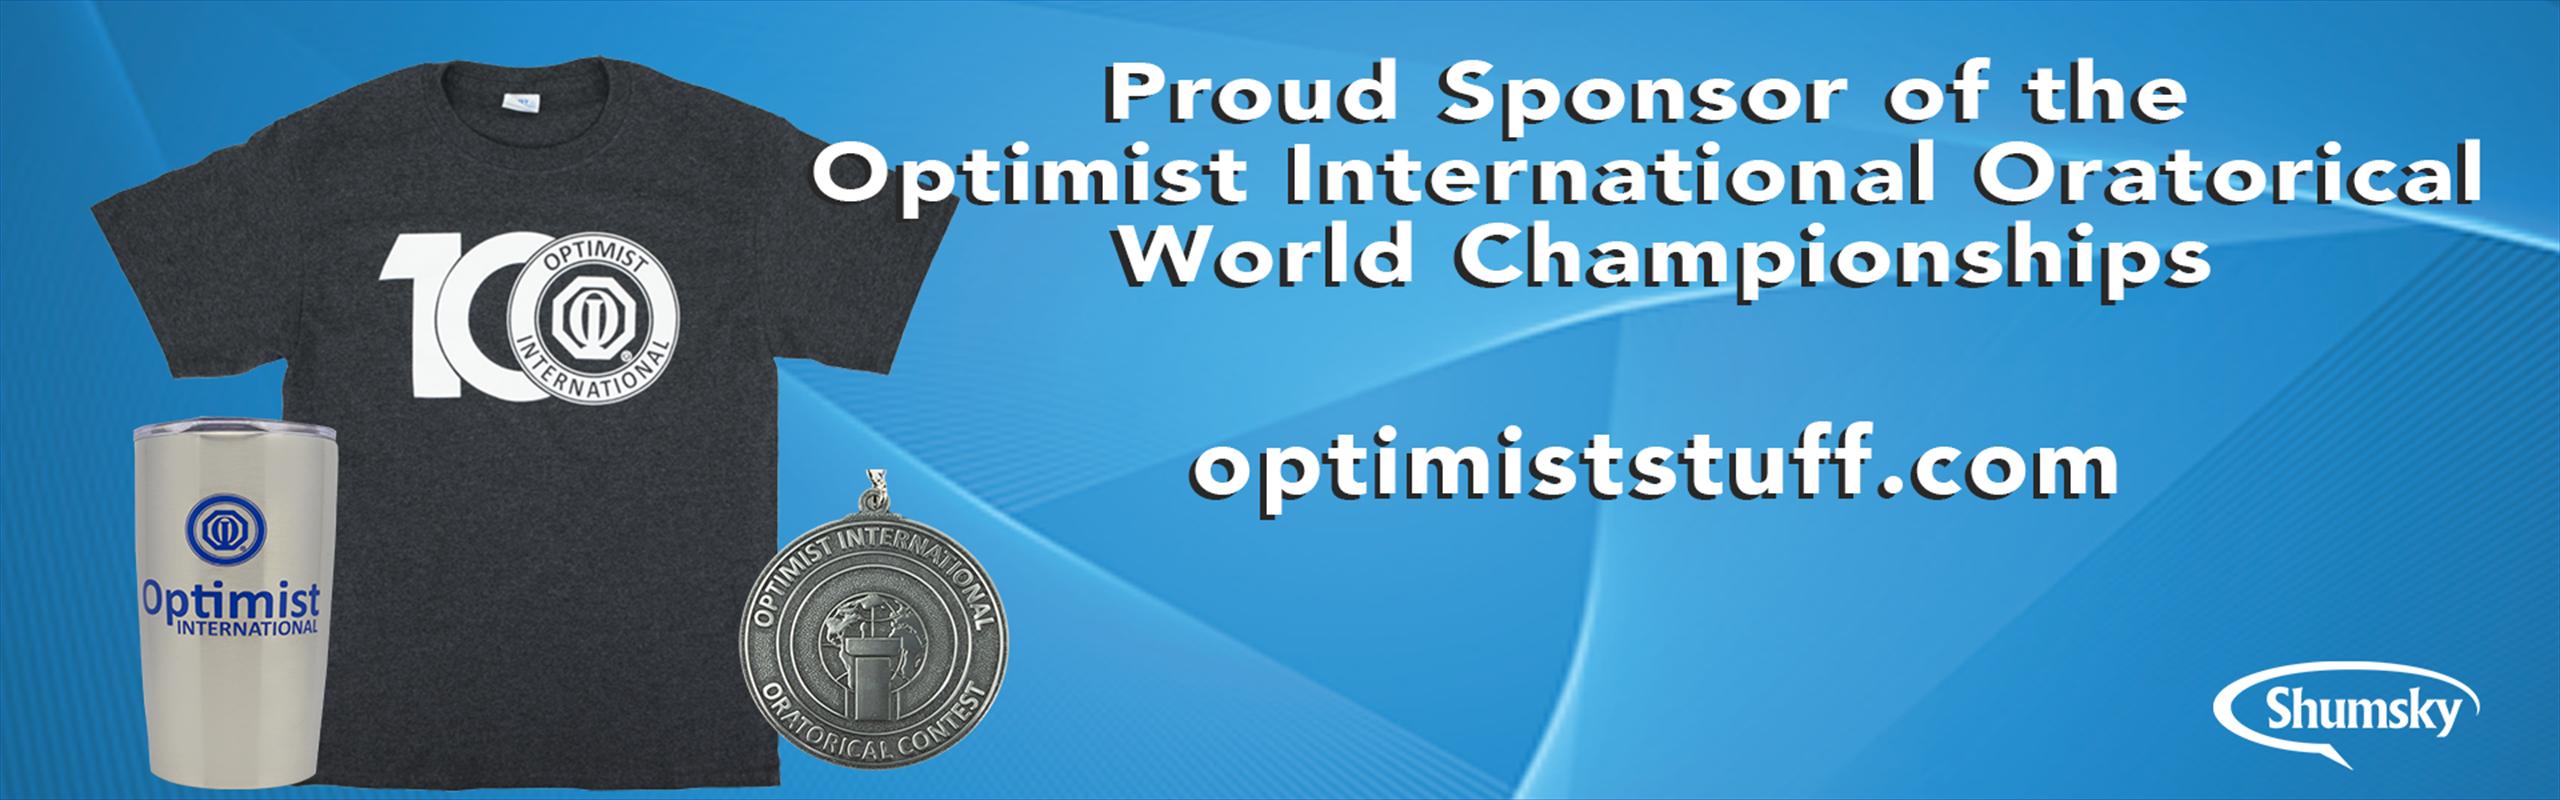 Optimist International Optimist International Home